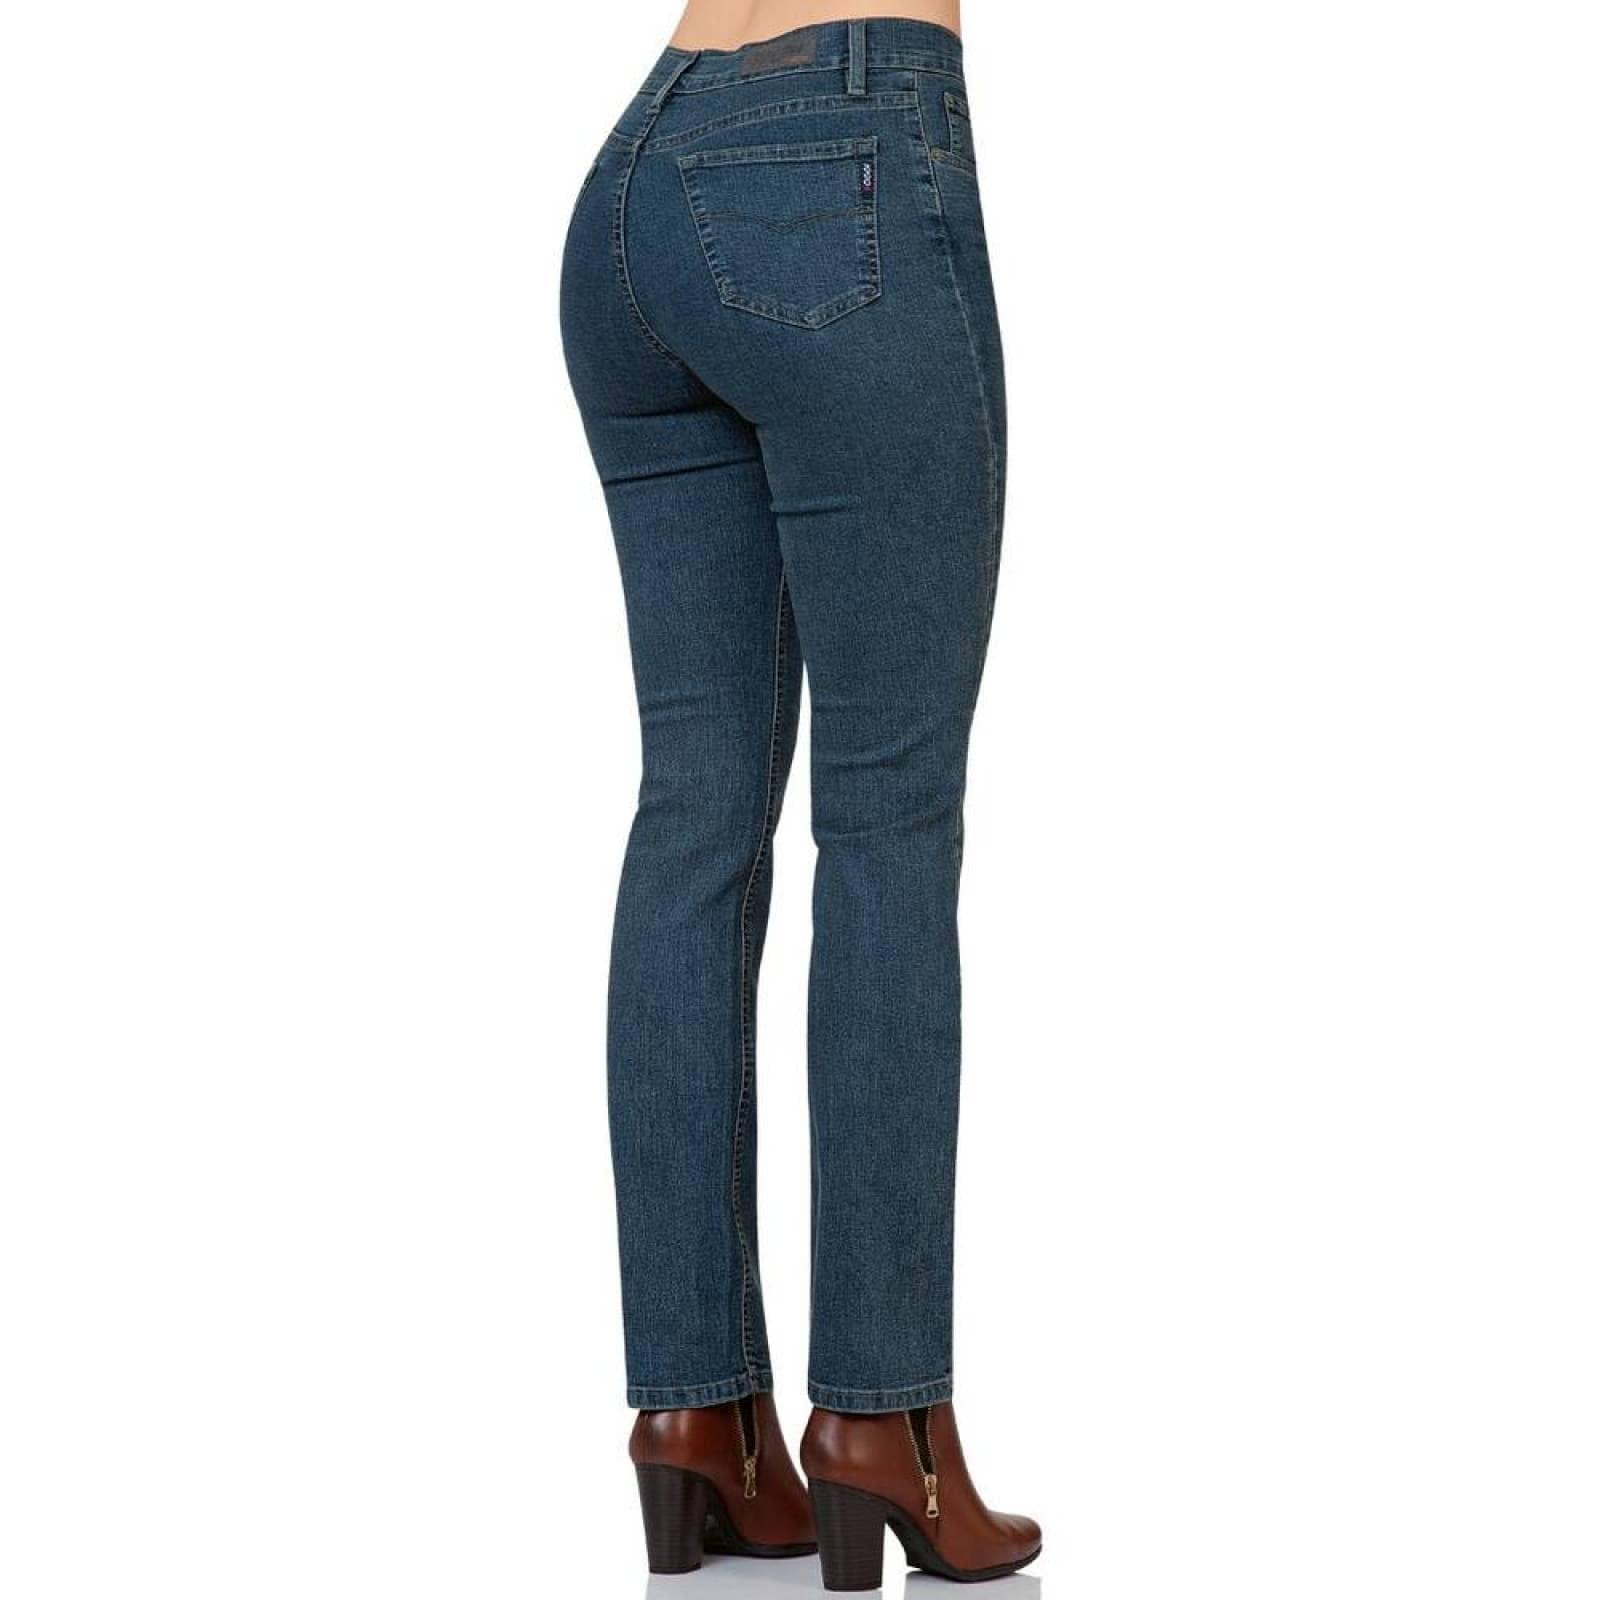 Jeans Oggi Jeans Mujer Slub Carbon Mezclilla Stretch Atraction